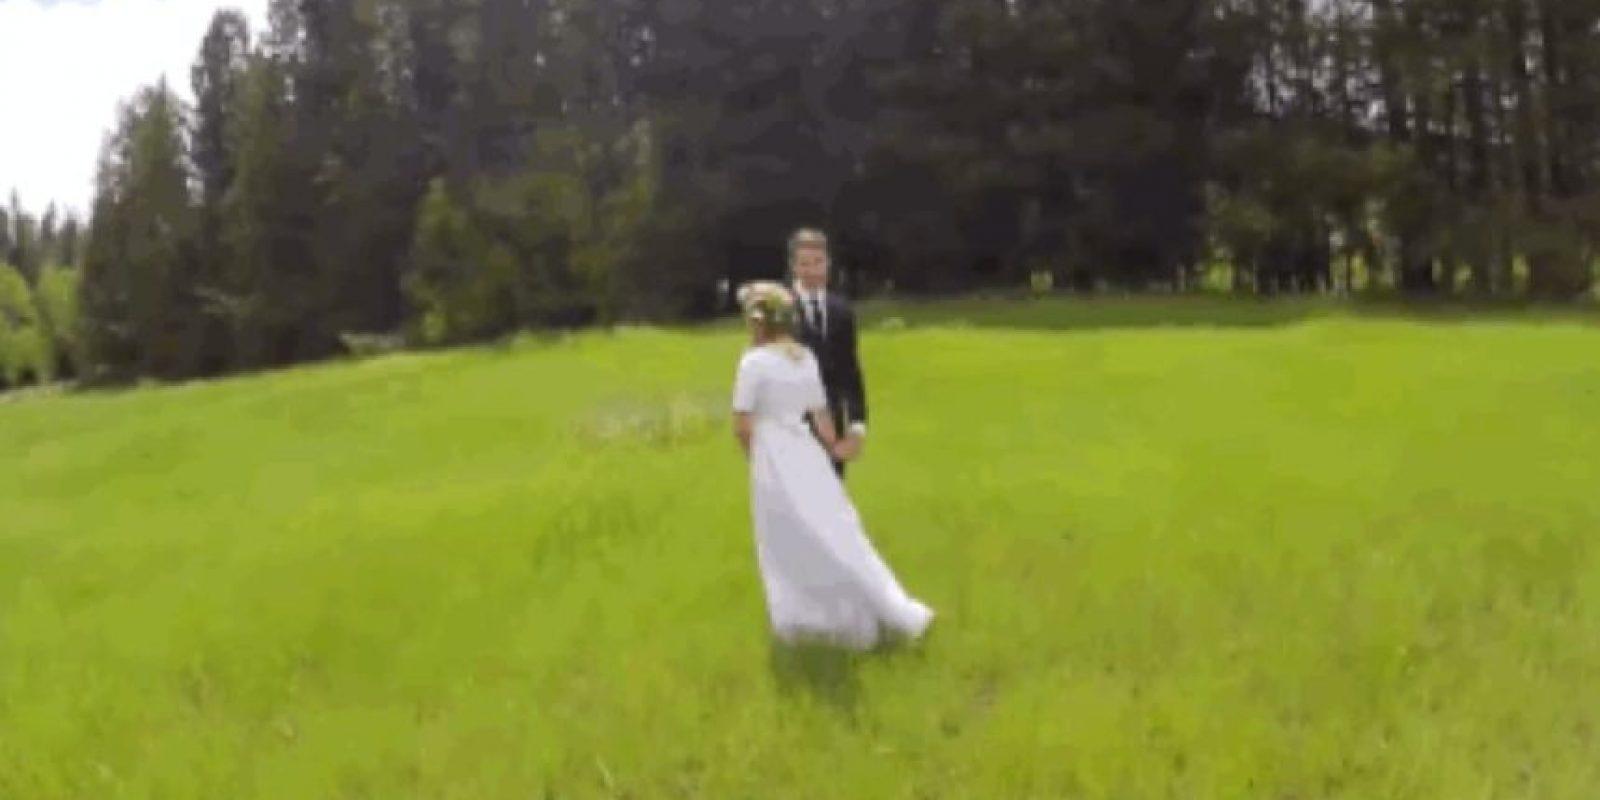 Un dron capta un momento romántico de una boda. Foto:vía Youtube